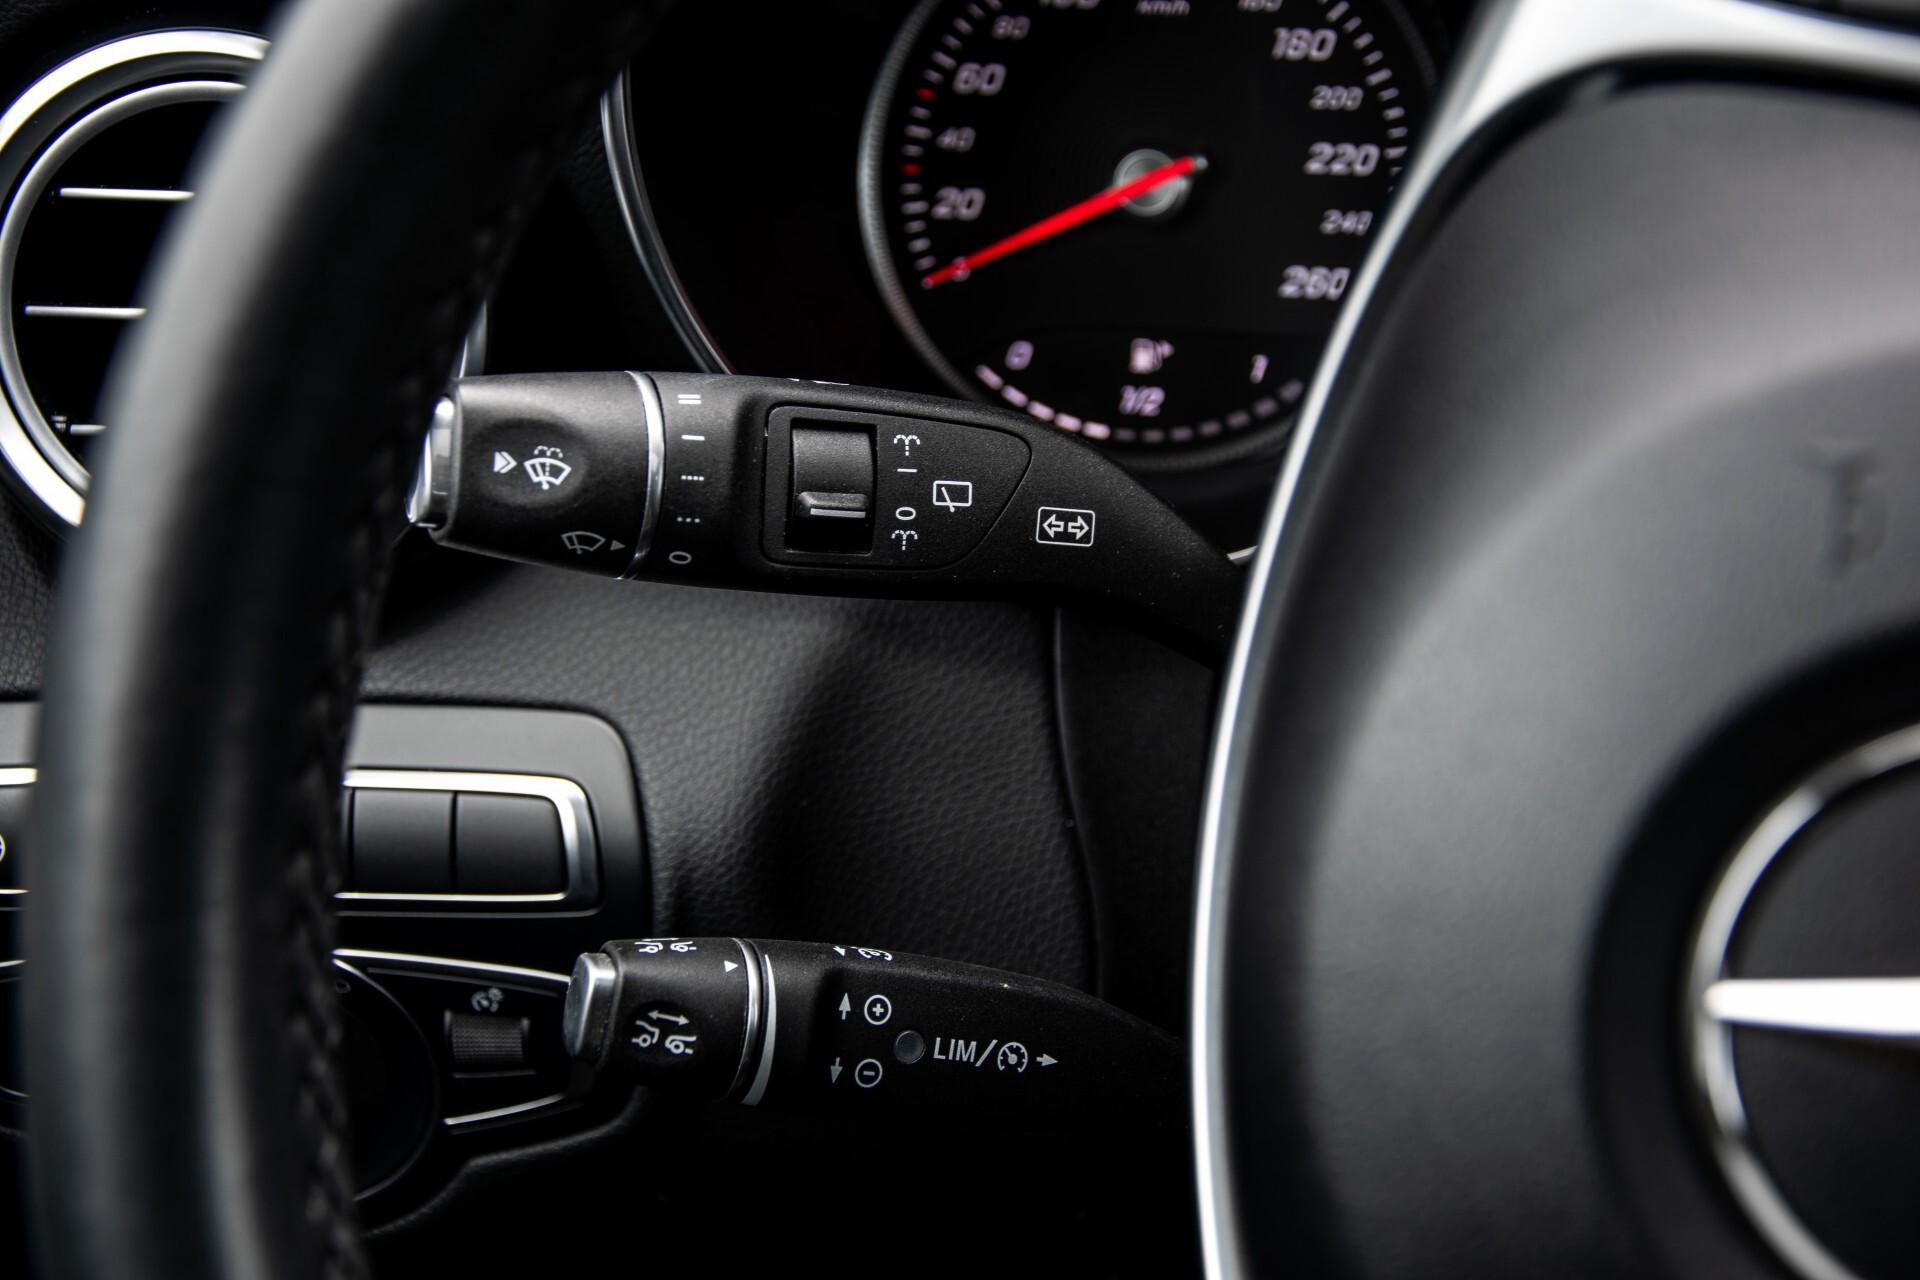 Mercedes-Benz GLC 220 d 4-M AMG/Distronic/Panorama/Comand/HUD/Afn-Trhk Aut9 Foto 10